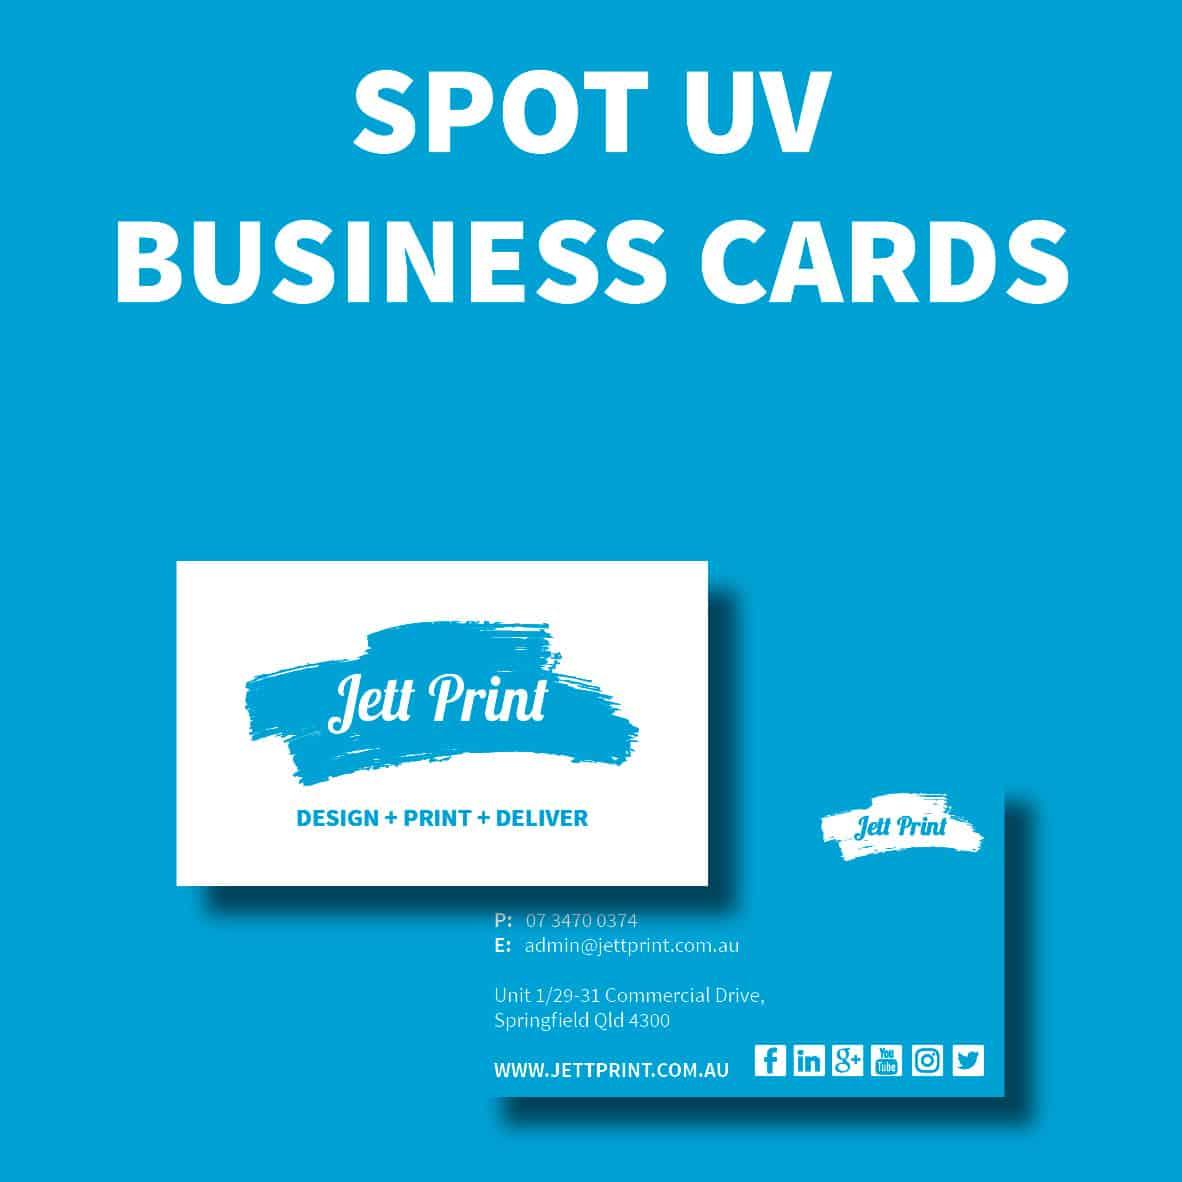 spot-uv-business-cards-printing-springfield-ipswich-brisbane19